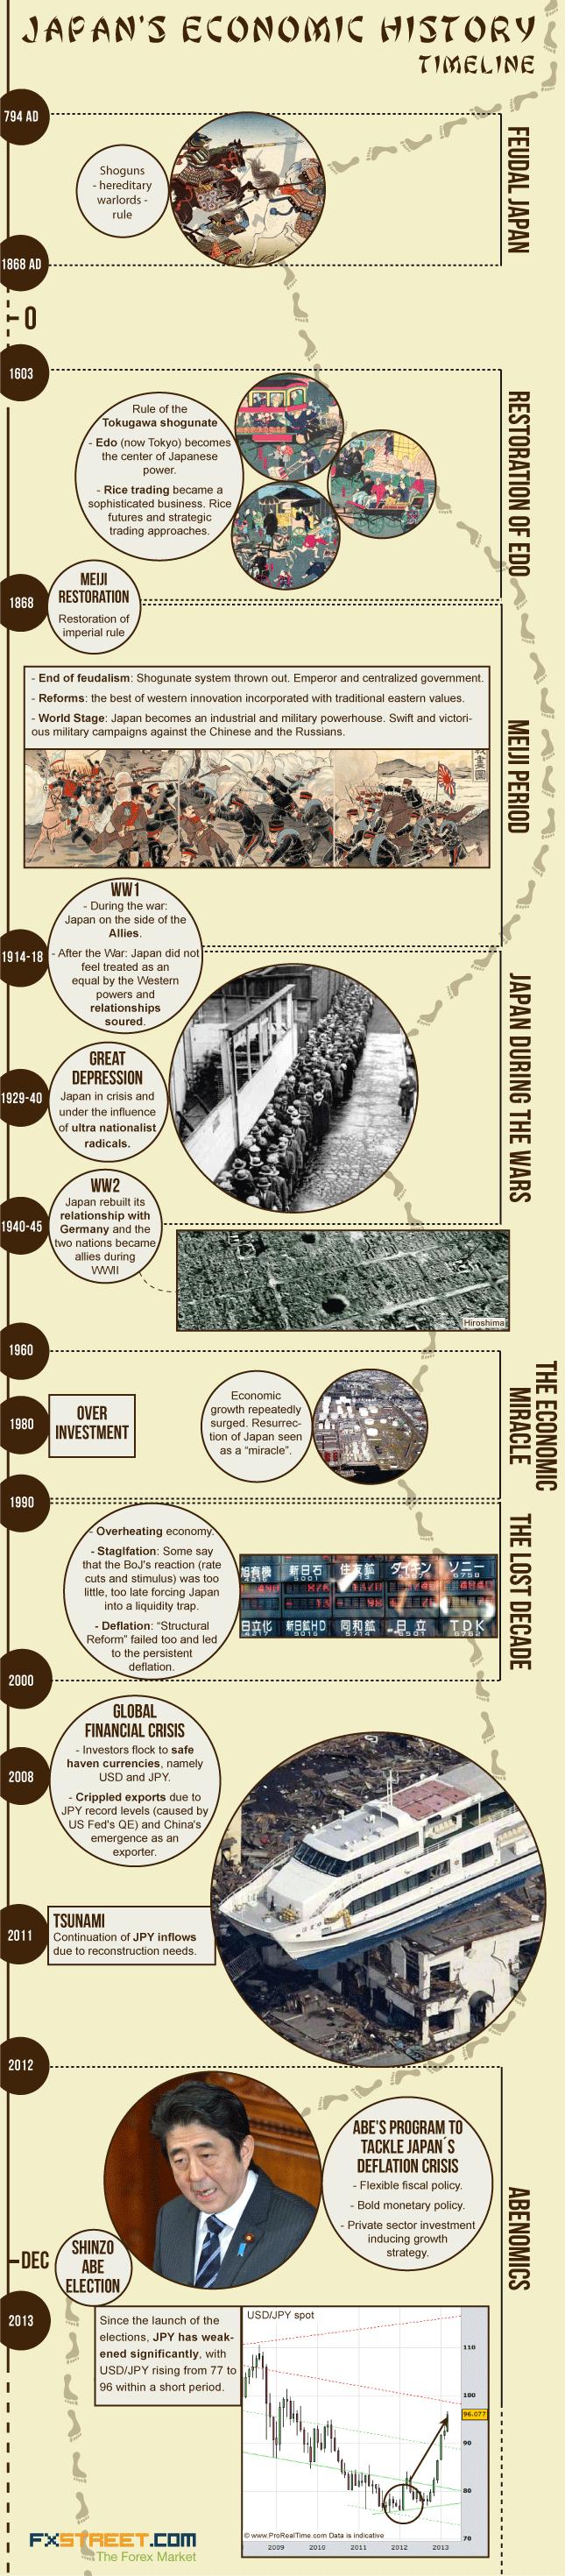 japan's economic history timeline